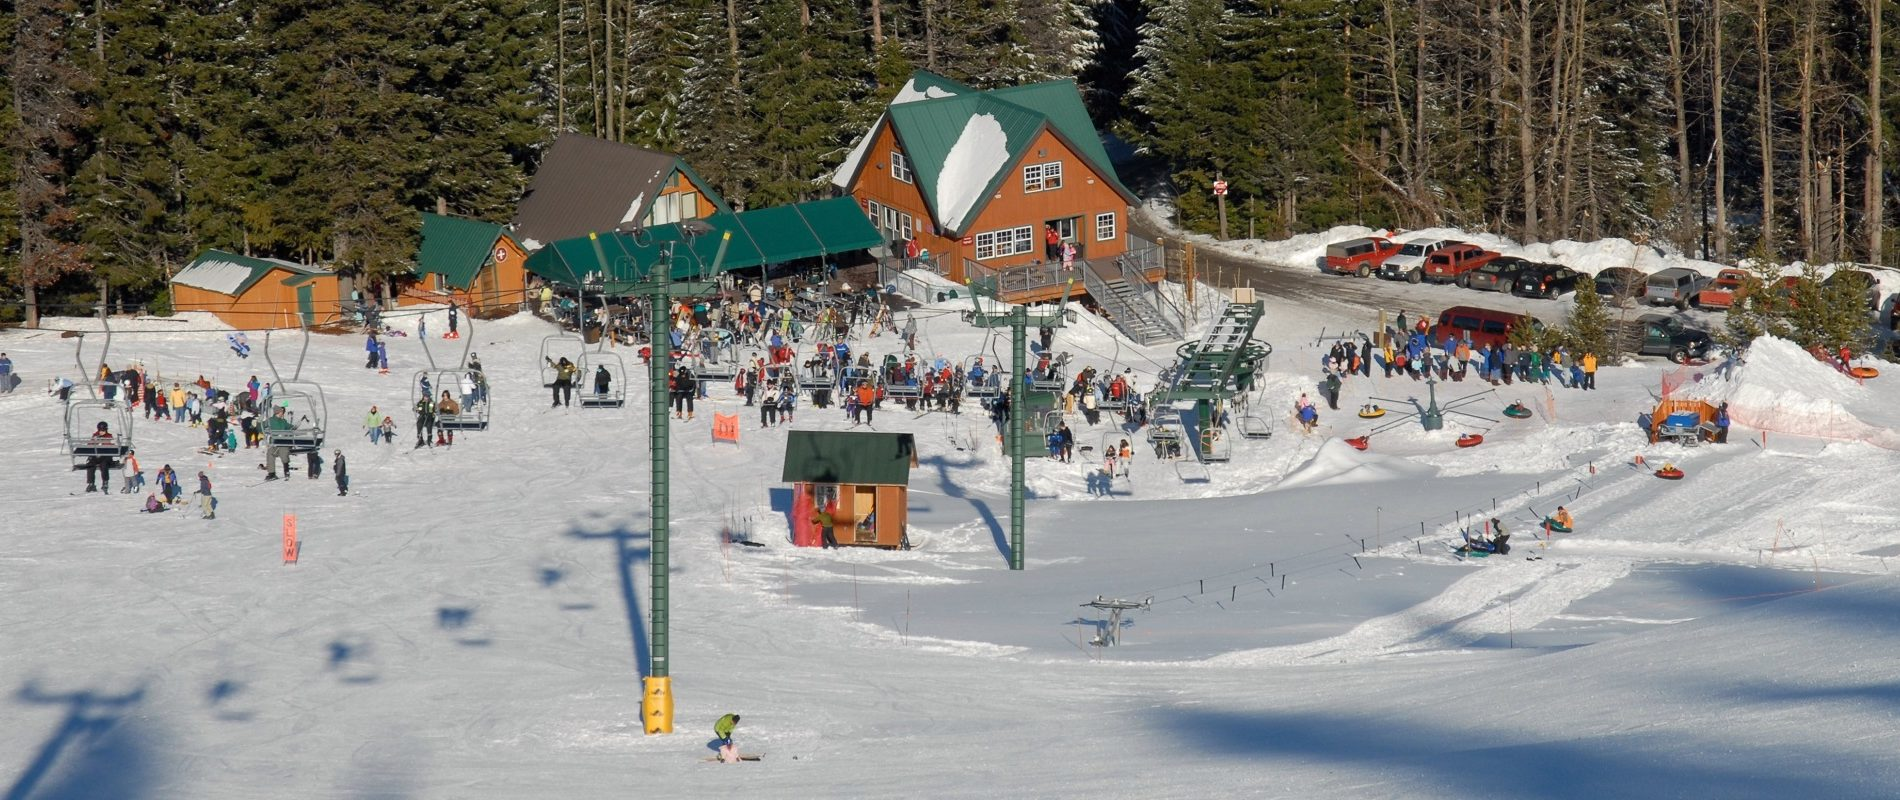 Cooper Spur Ski Area Snow